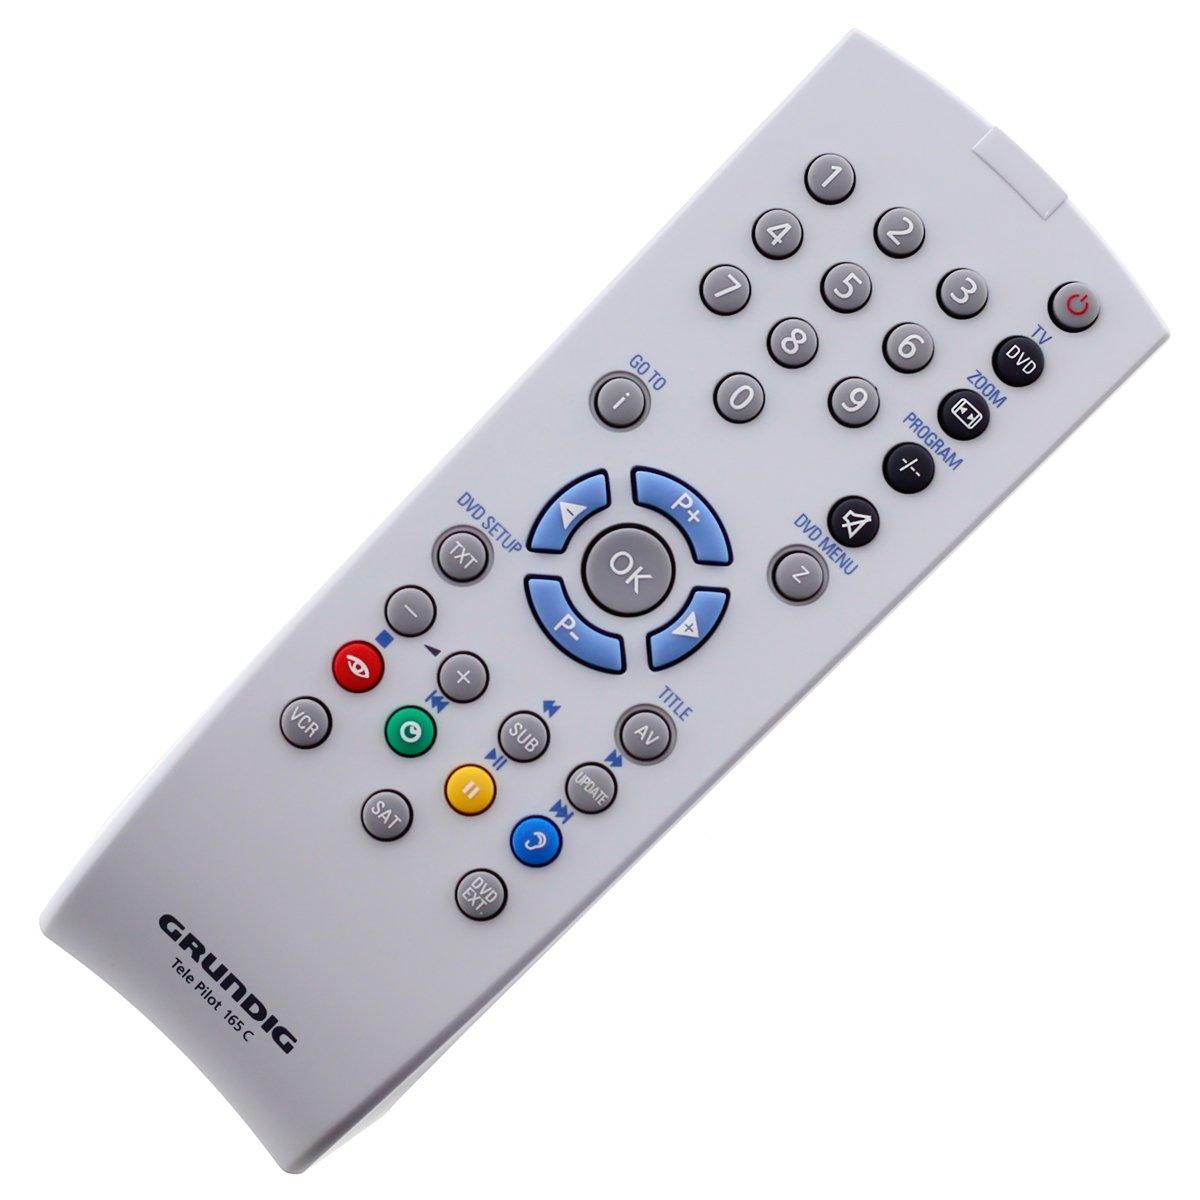 Original TV Control Remoto Mando a Distancia Grundig TV Tele Pilot 160-E TP1 TP 160-C TP160 TP 160: Amazon.es: Electrónica